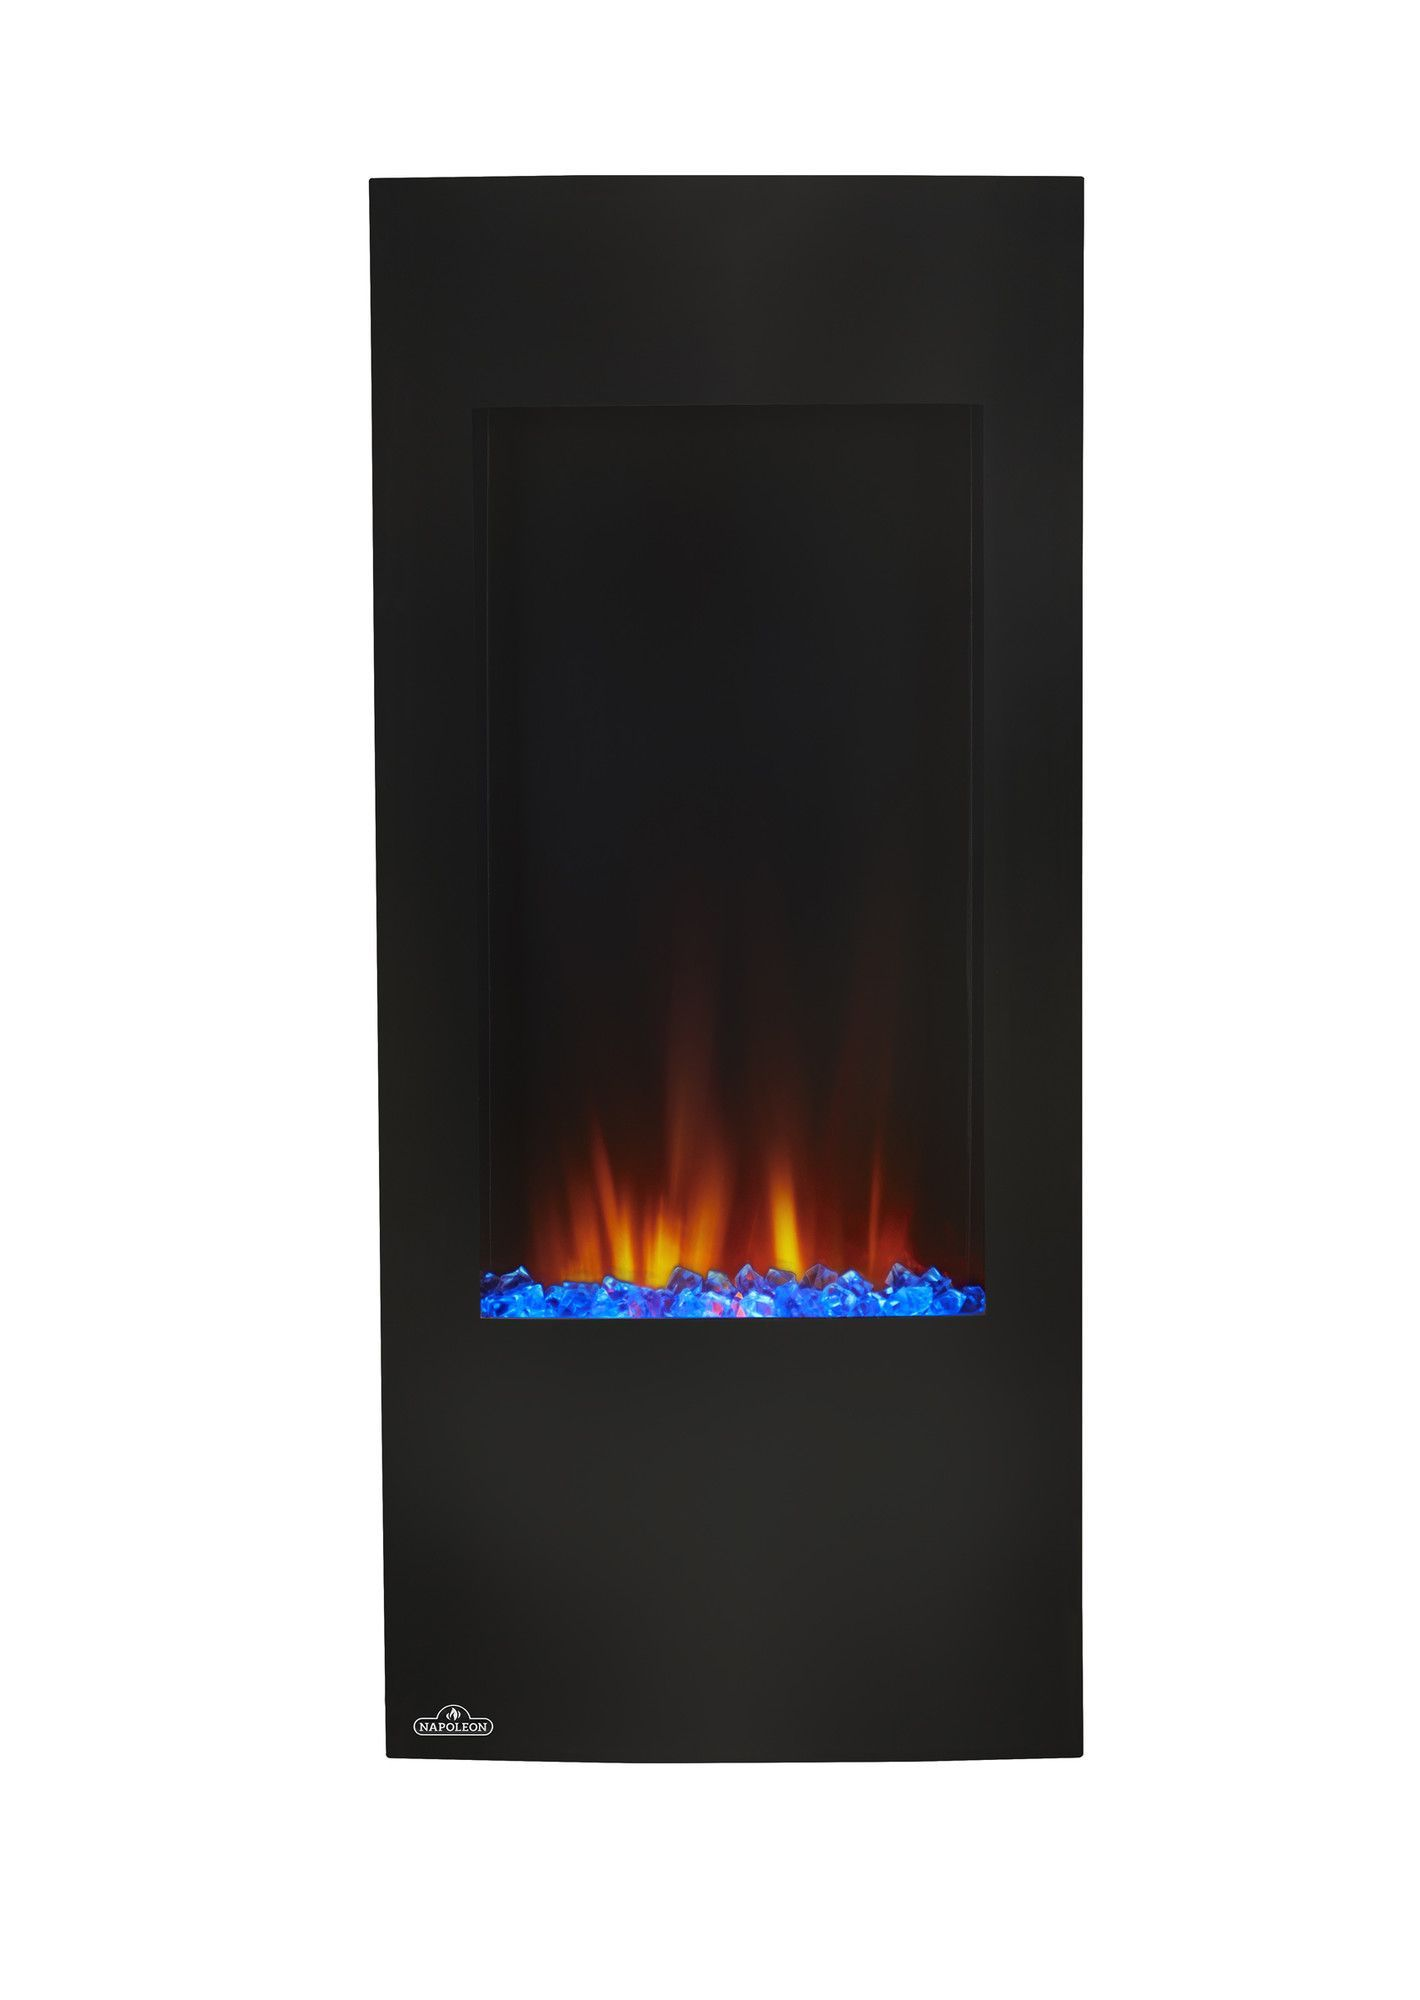 Wayfair Fireplace Screen Unique Allure™ Electric Fireplace